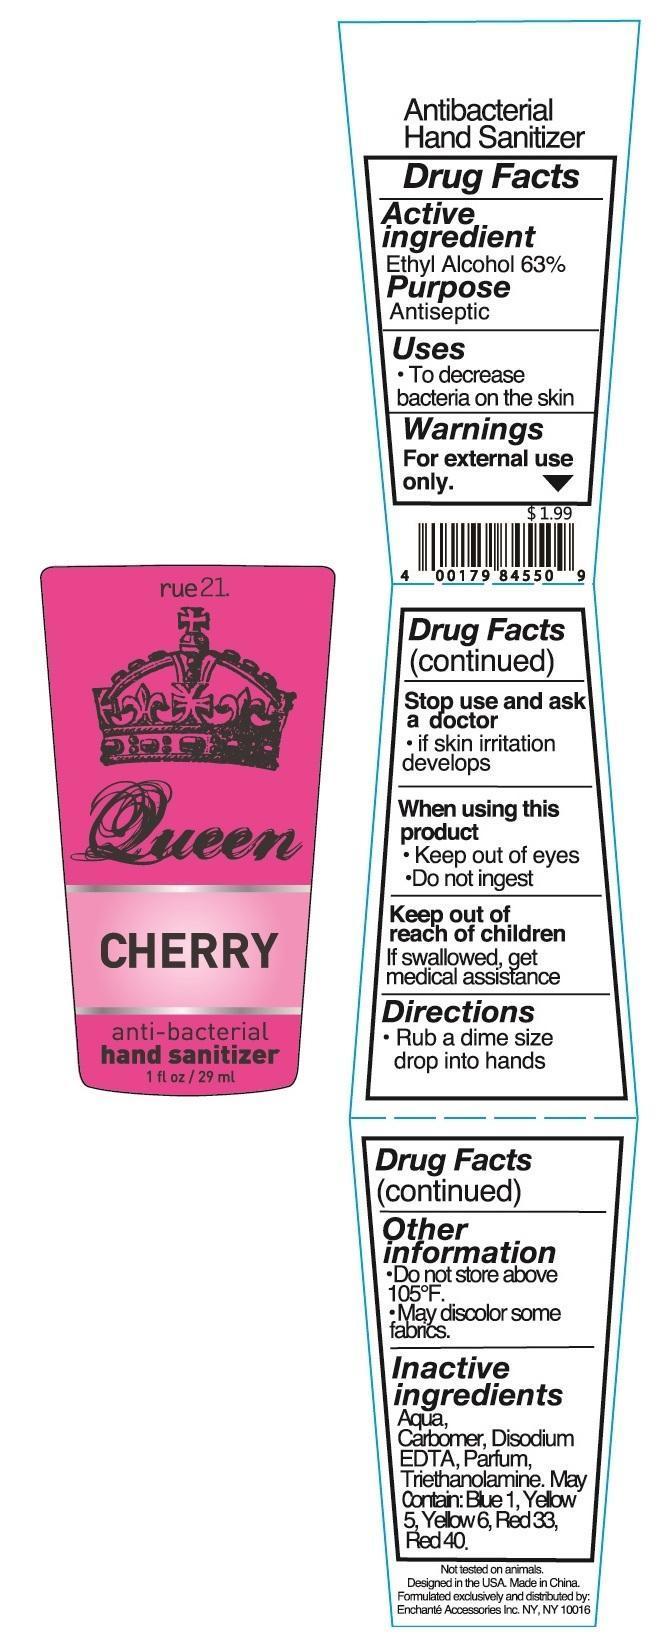 Rue 21 Queen Cherry Anti Bacterial Hand Sanitizer (Alcohol) Liquid [Enchante Accessories Inc. ]